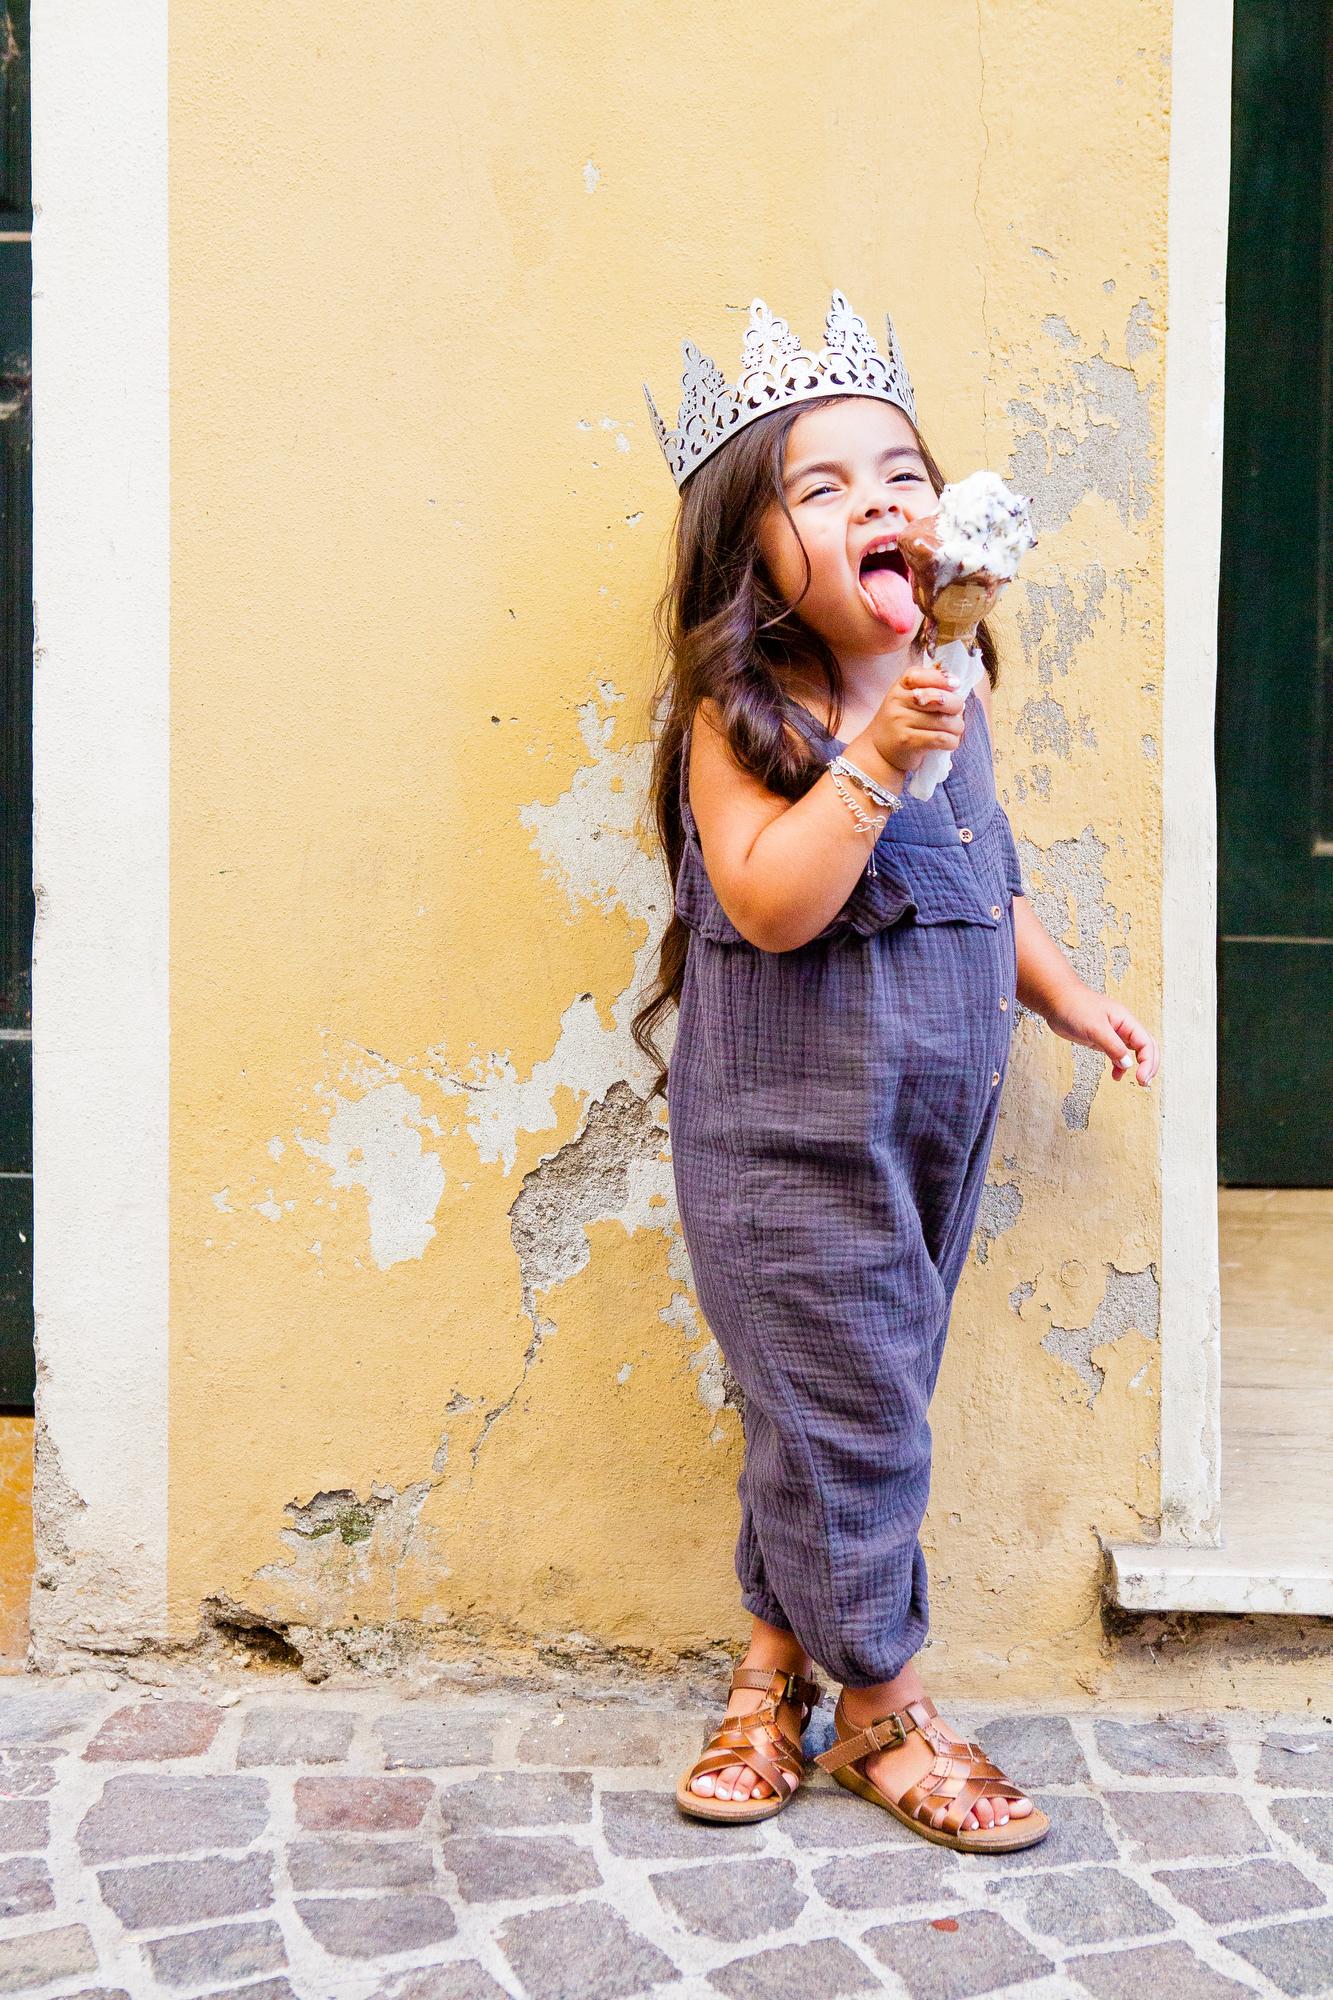 Ice cream girl | Freckle & Fox Photos